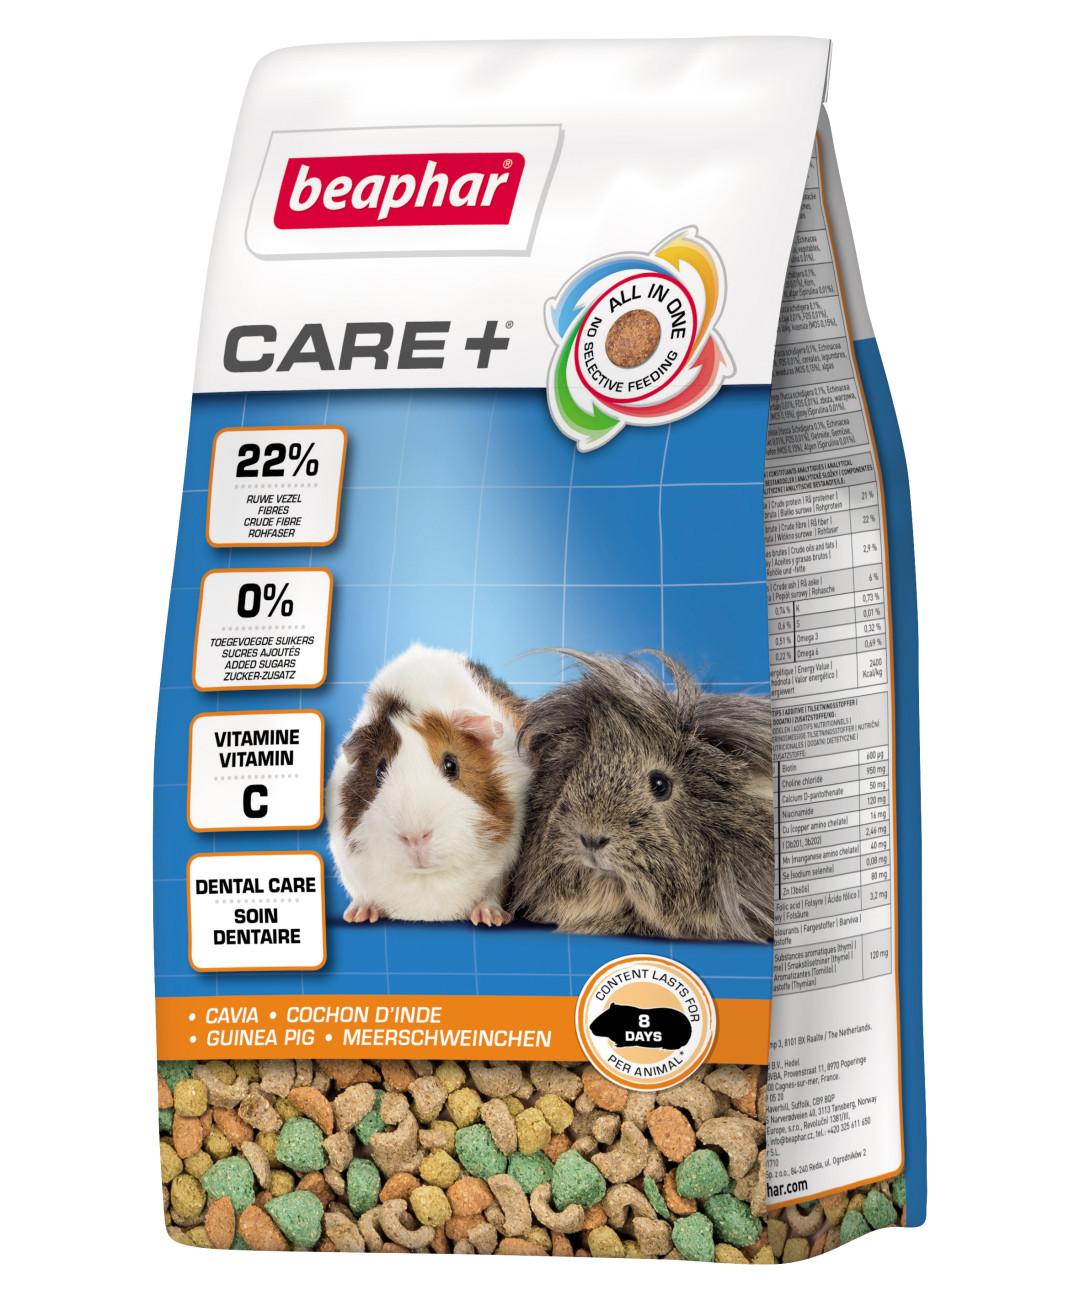 Beaphar Care+ cavia 250 gr